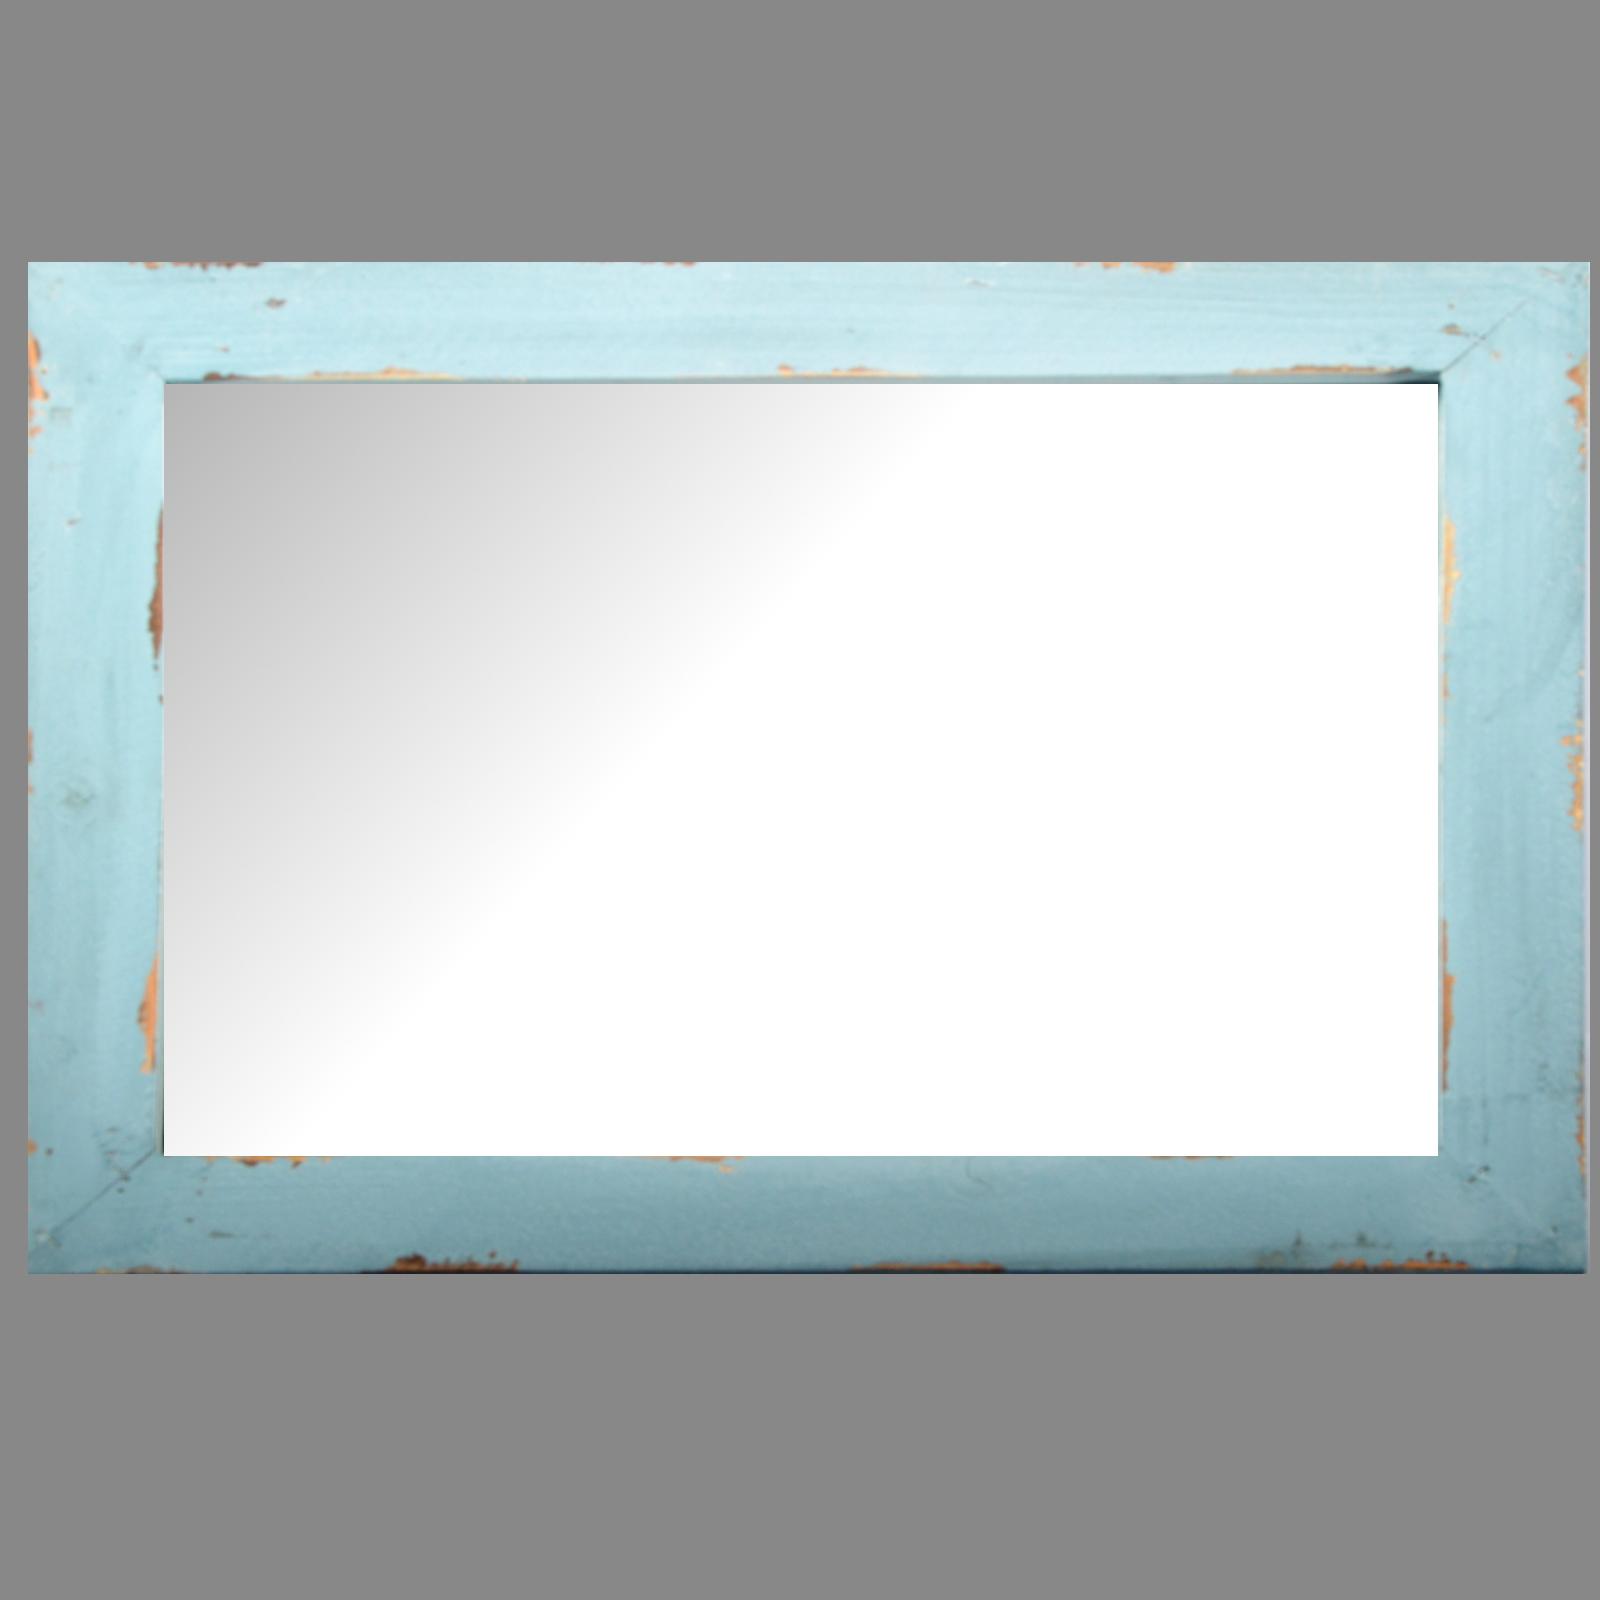 3 farben spiegel wandspiegel shabby landhaus h ngespiegel. Black Bedroom Furniture Sets. Home Design Ideas